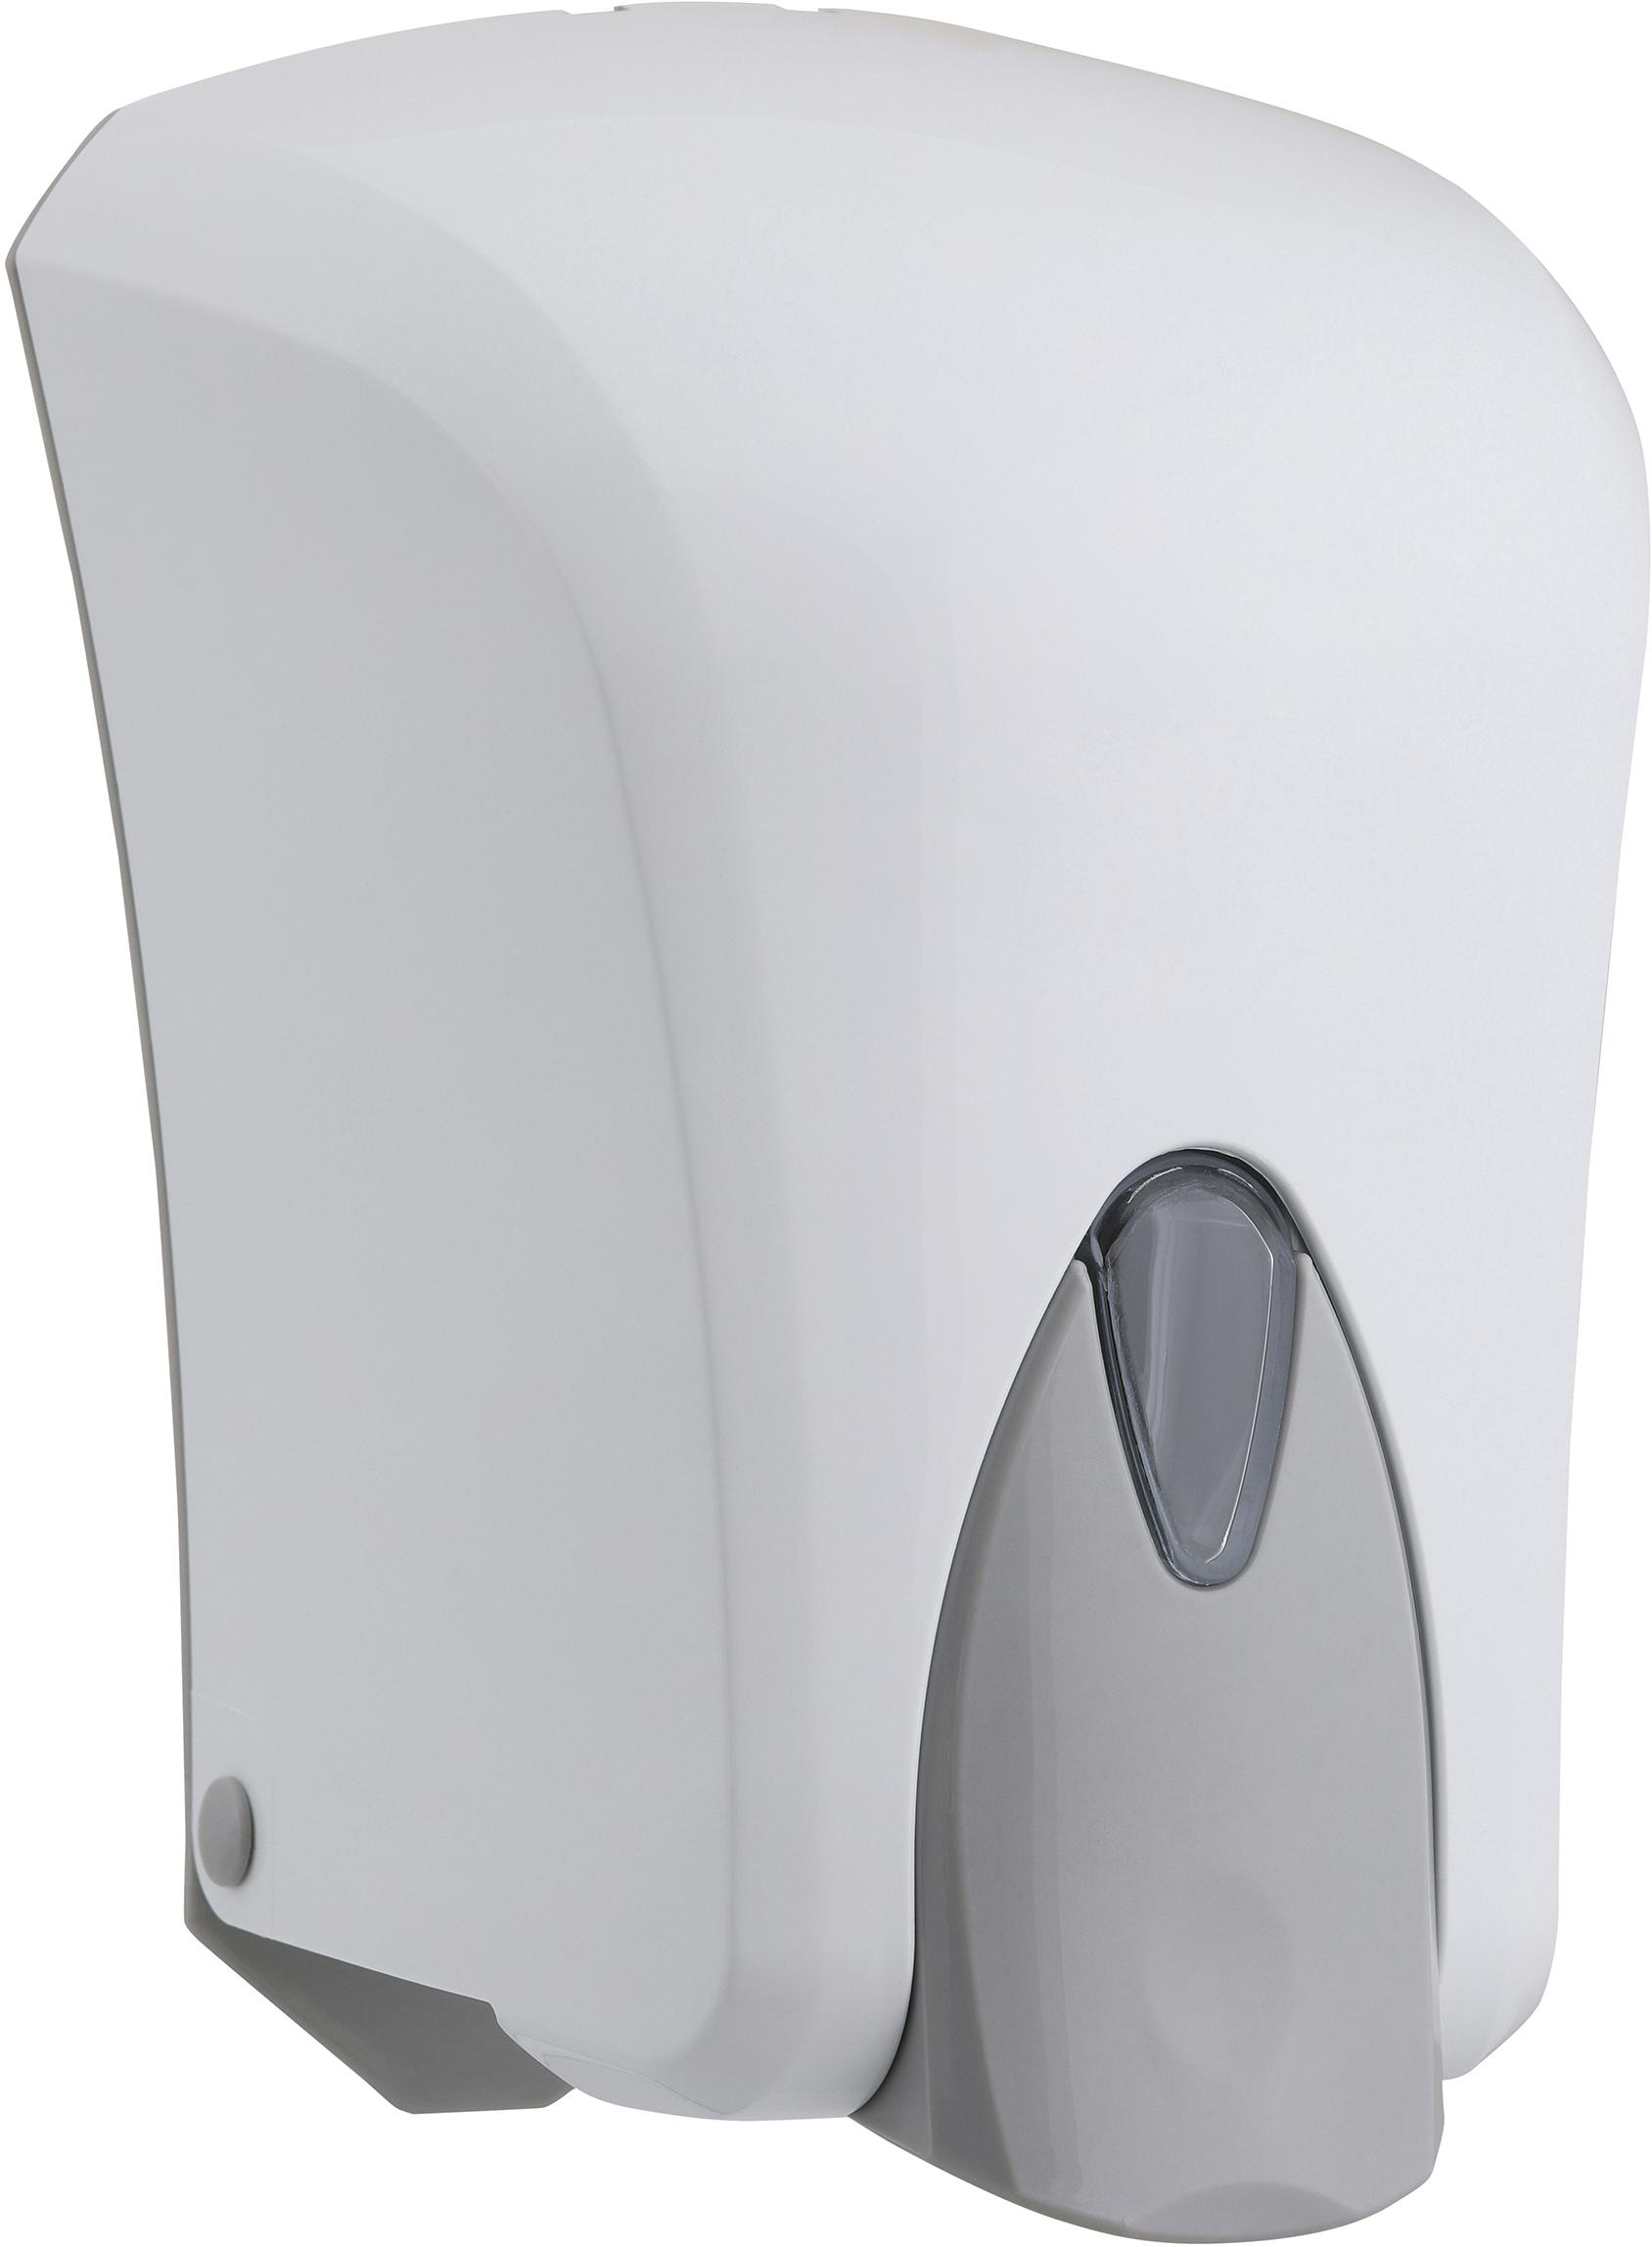 Дозатор для жидкого мыла Nowa S6 nowa диспенсер nowa k7 nowa